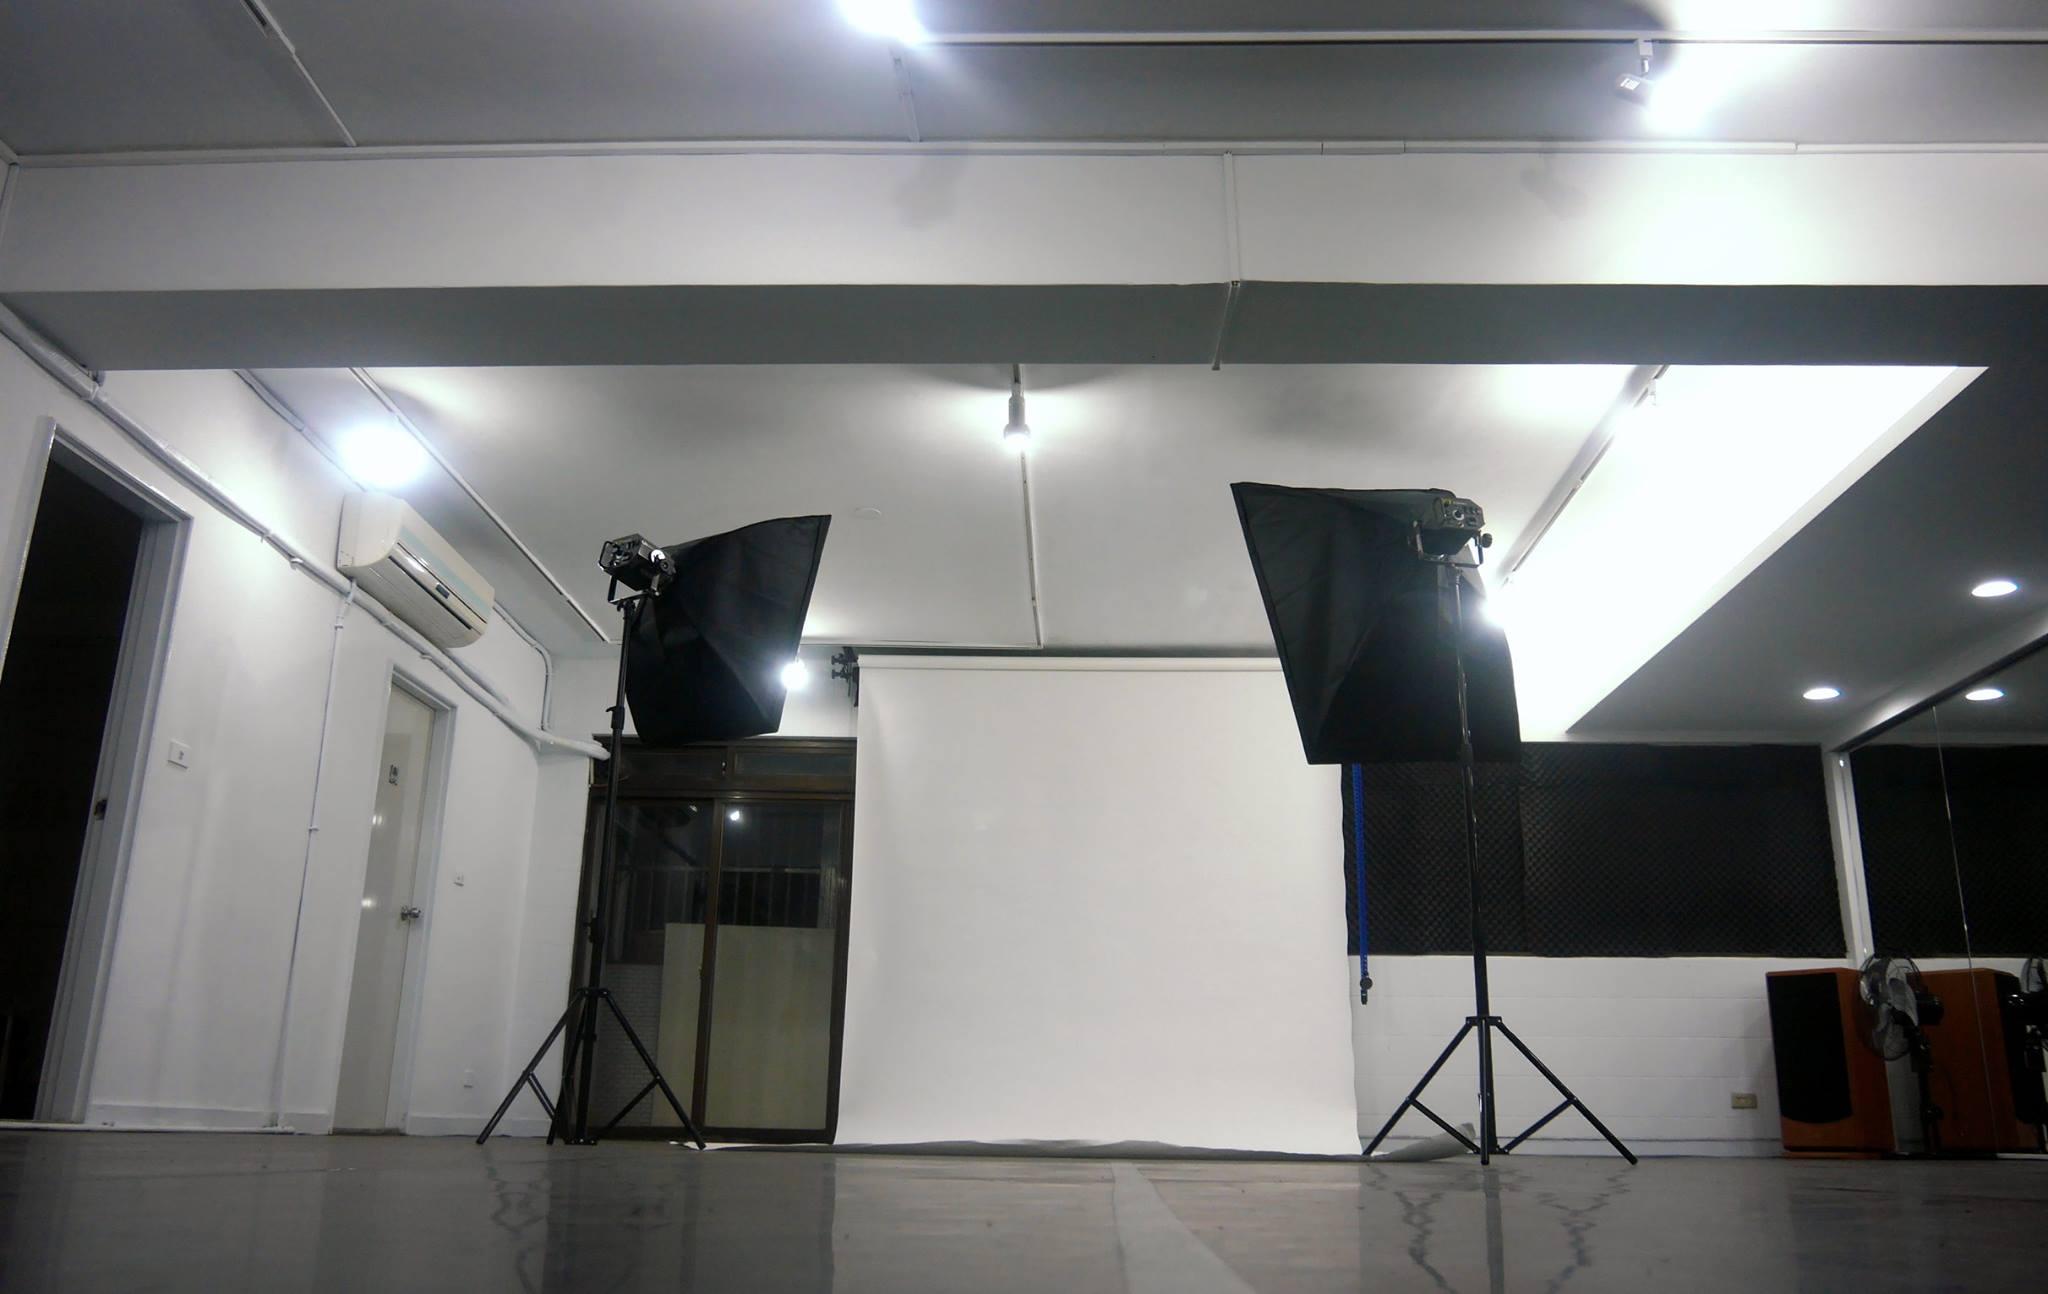 Vaste Studio/西門町空間租借/大型舞蹈教室/攝影棚承租/排練場地/展演空間/30坪/0976517460 - 20150316000151-435450140.jpg(圖)